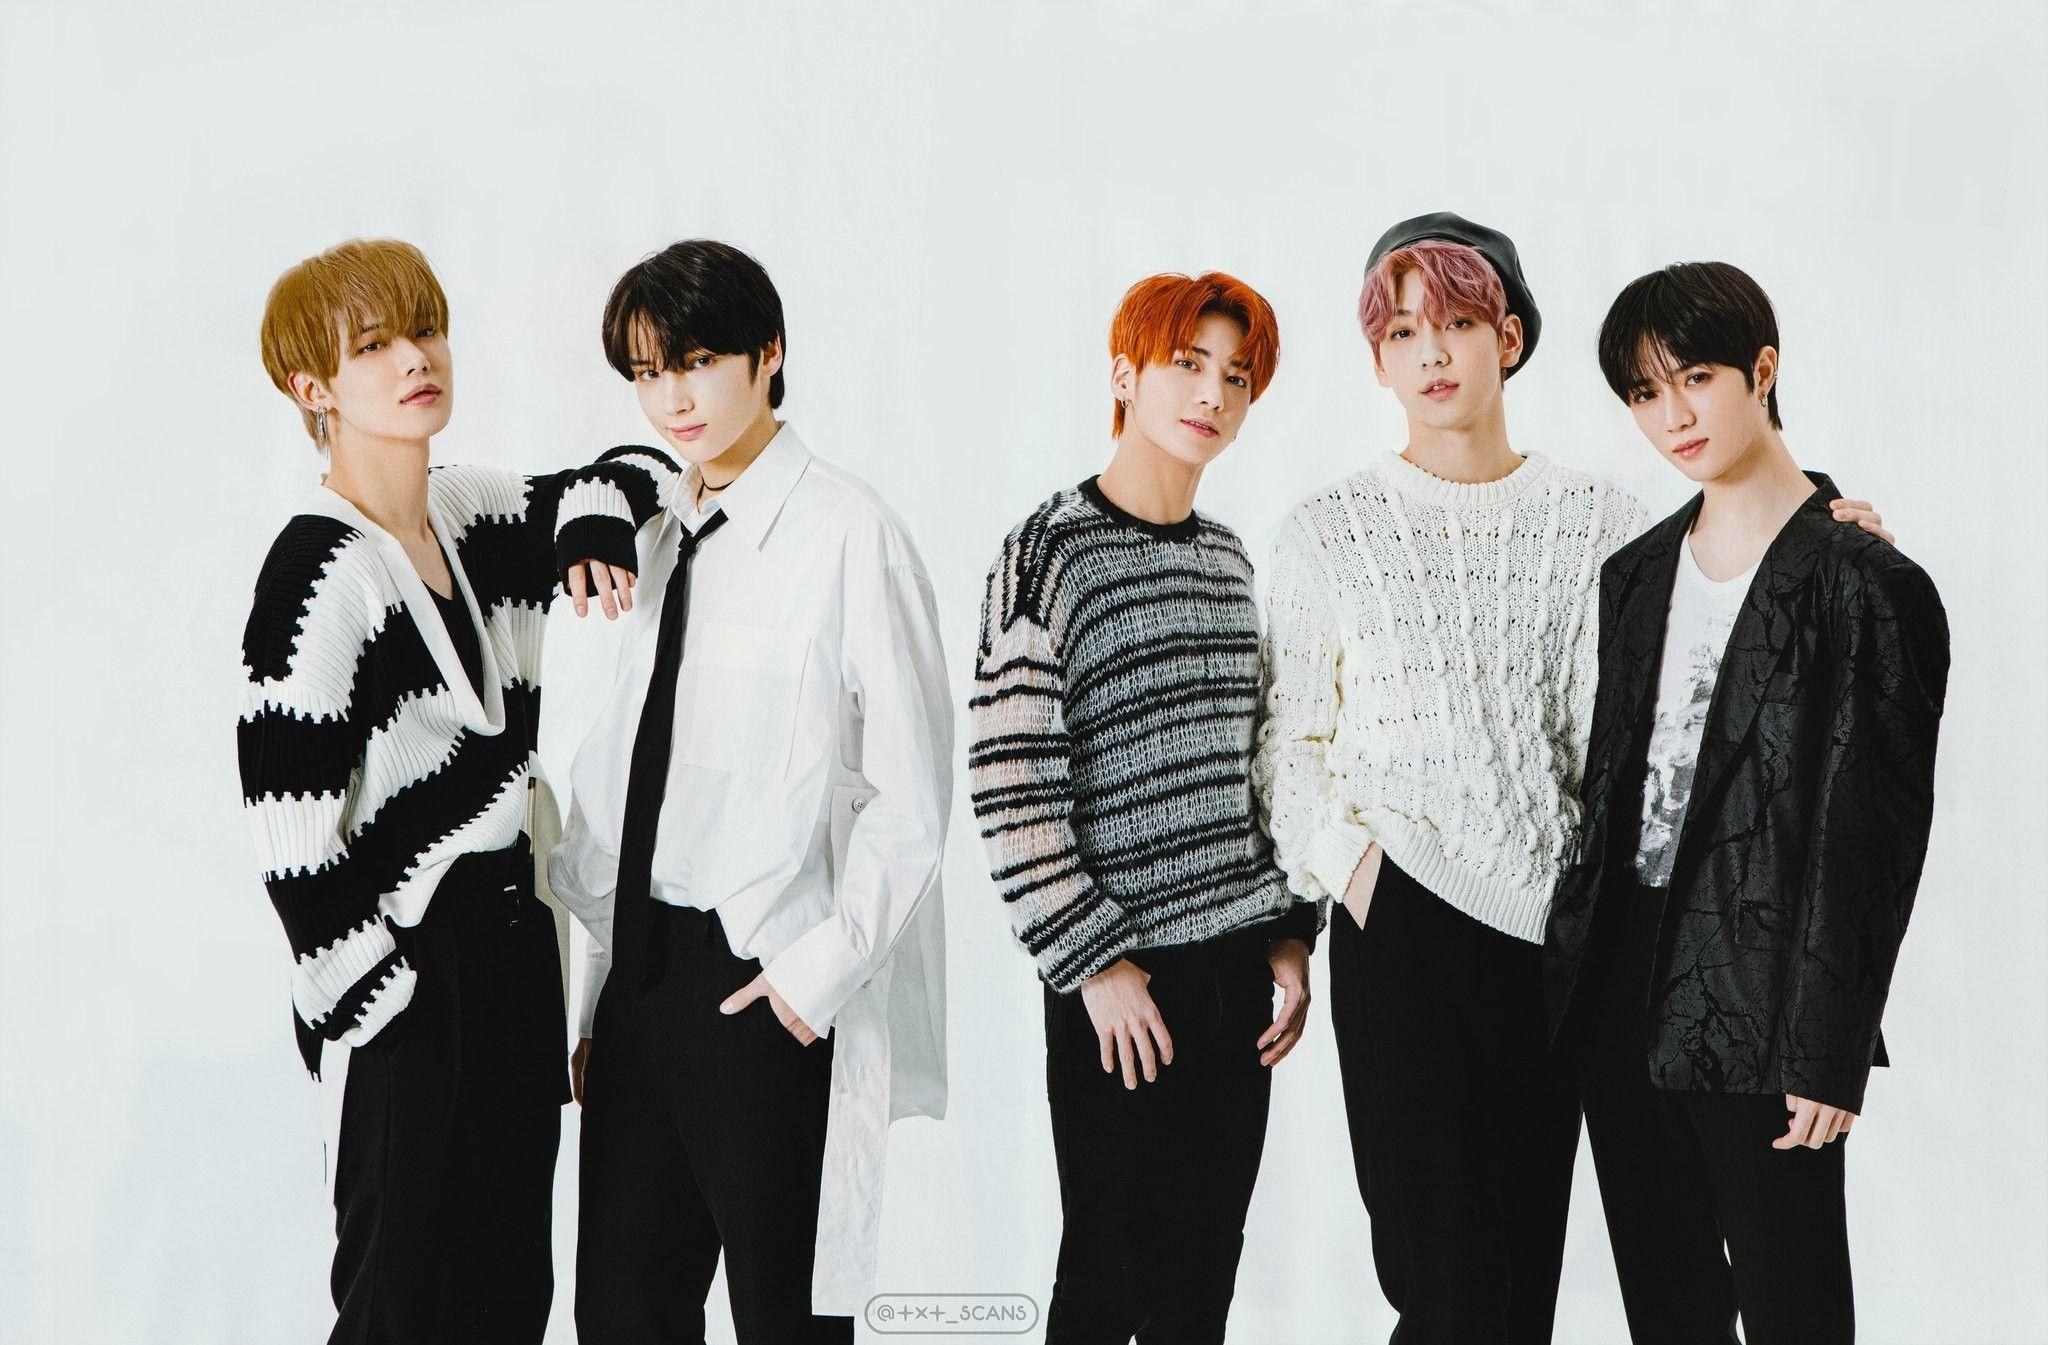 Pin By Mochigurl On Txt Txt South Korean Boy Band Boy Bands